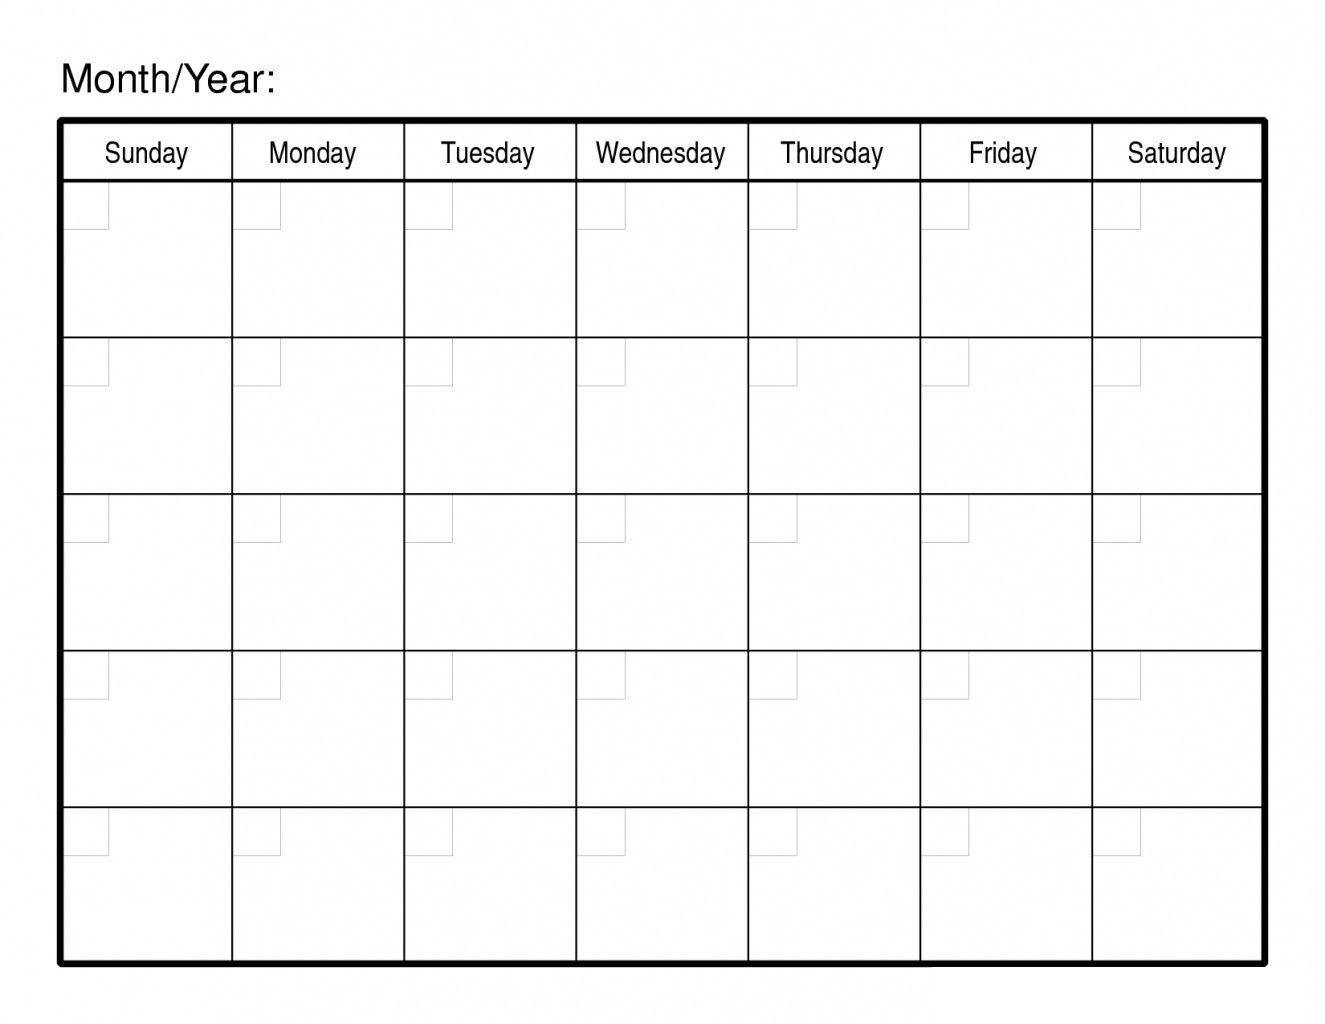 Free Printable 30 Day Calendars - Calendar Inspiration Design